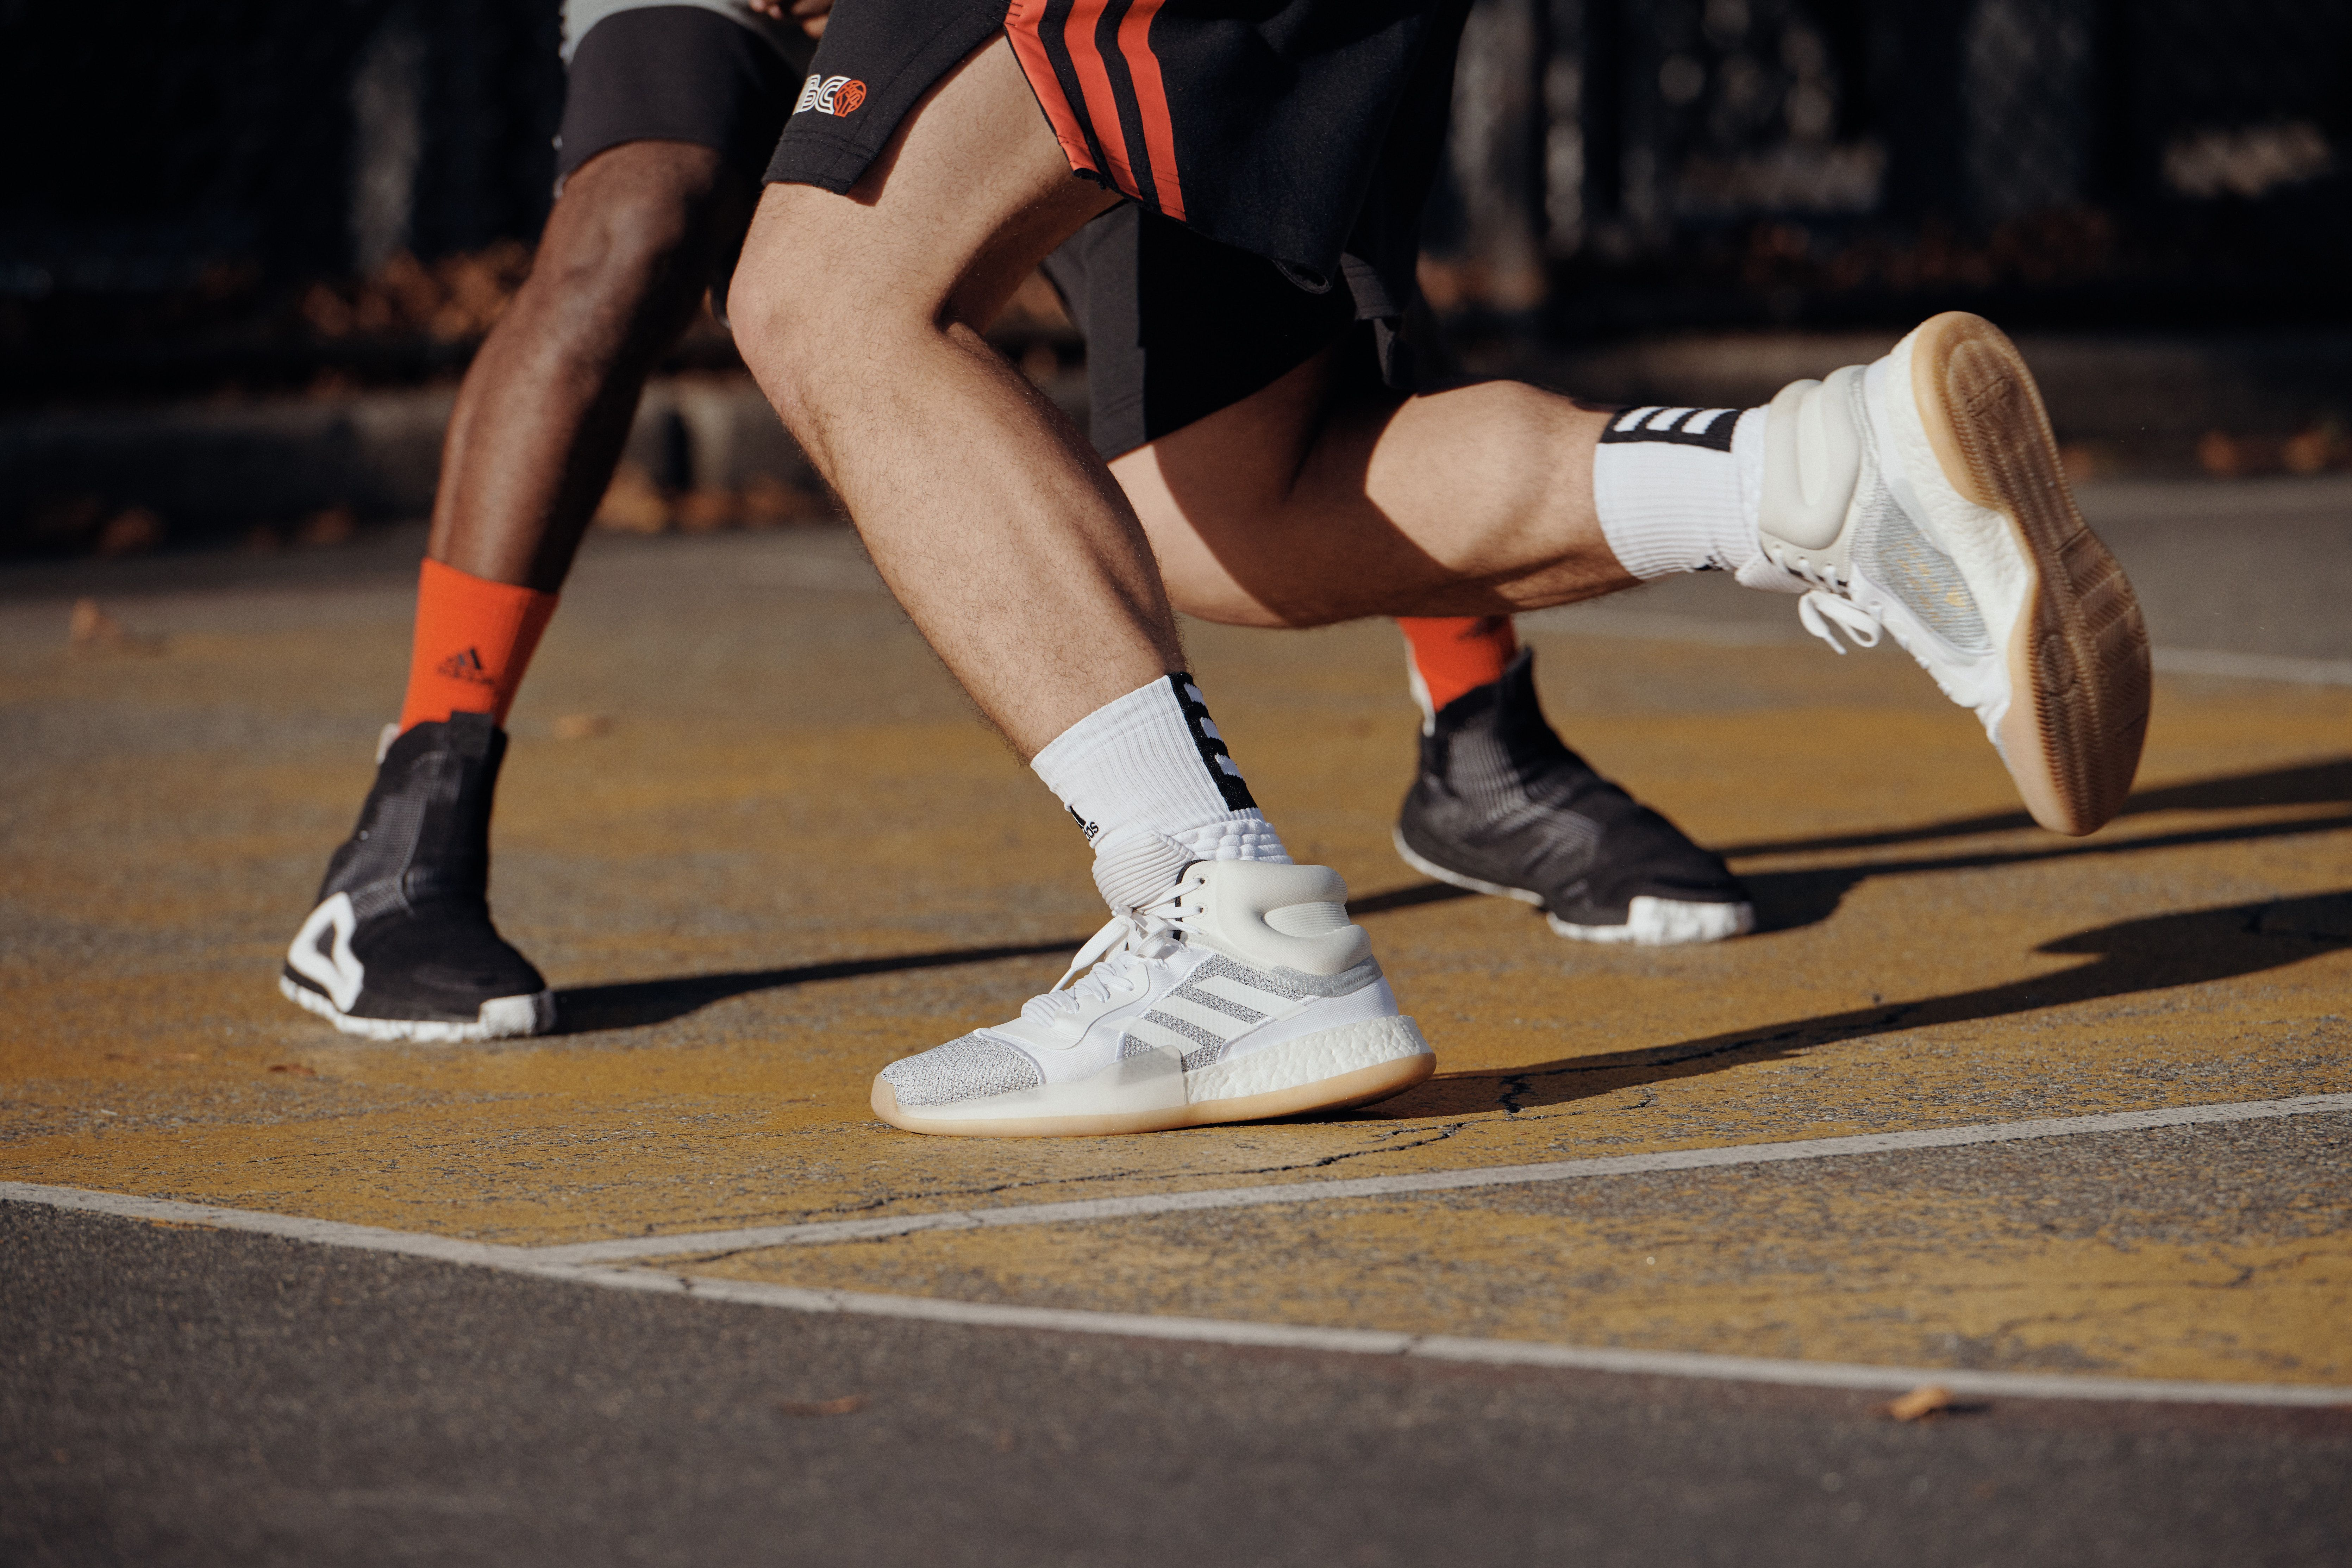 2zapatillas adidas hombre 2019 baloncesto